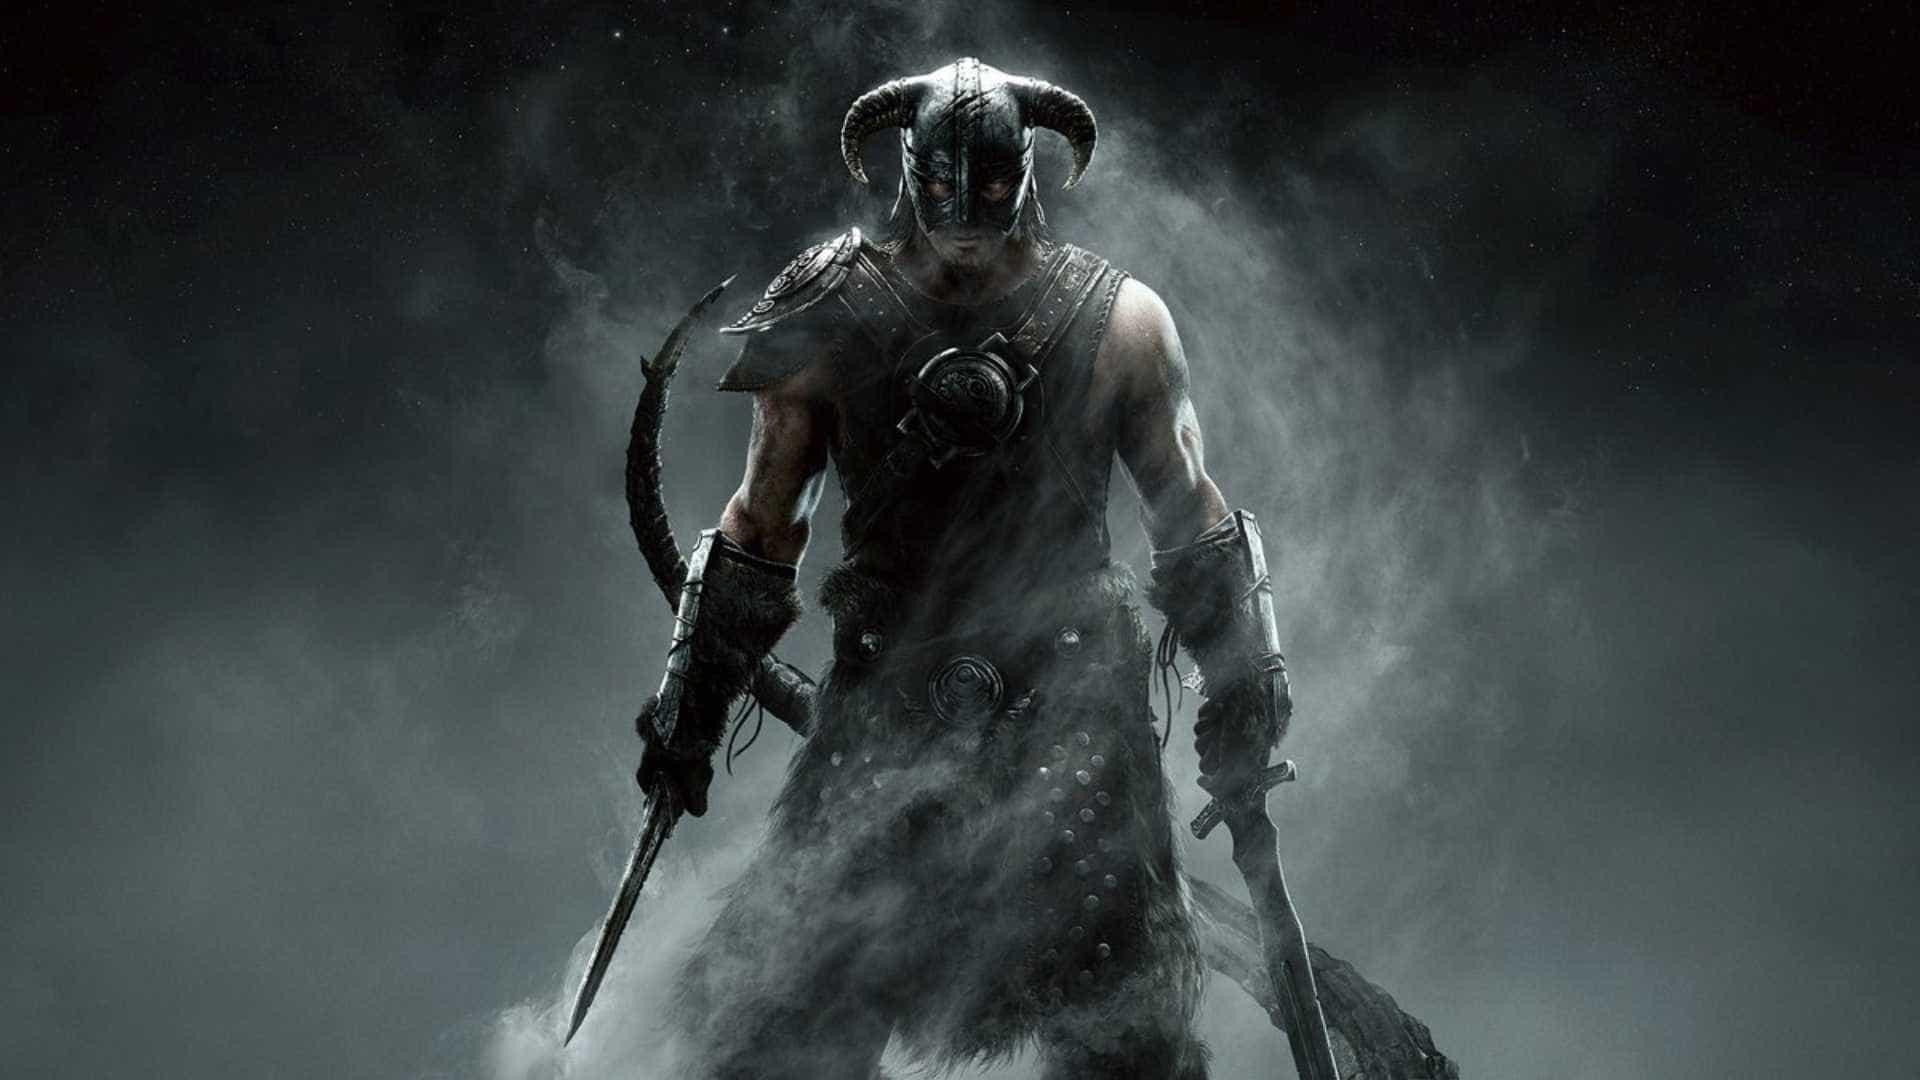 Bethesda anuncia 'The Elder Scrolls VI'; veja teaser